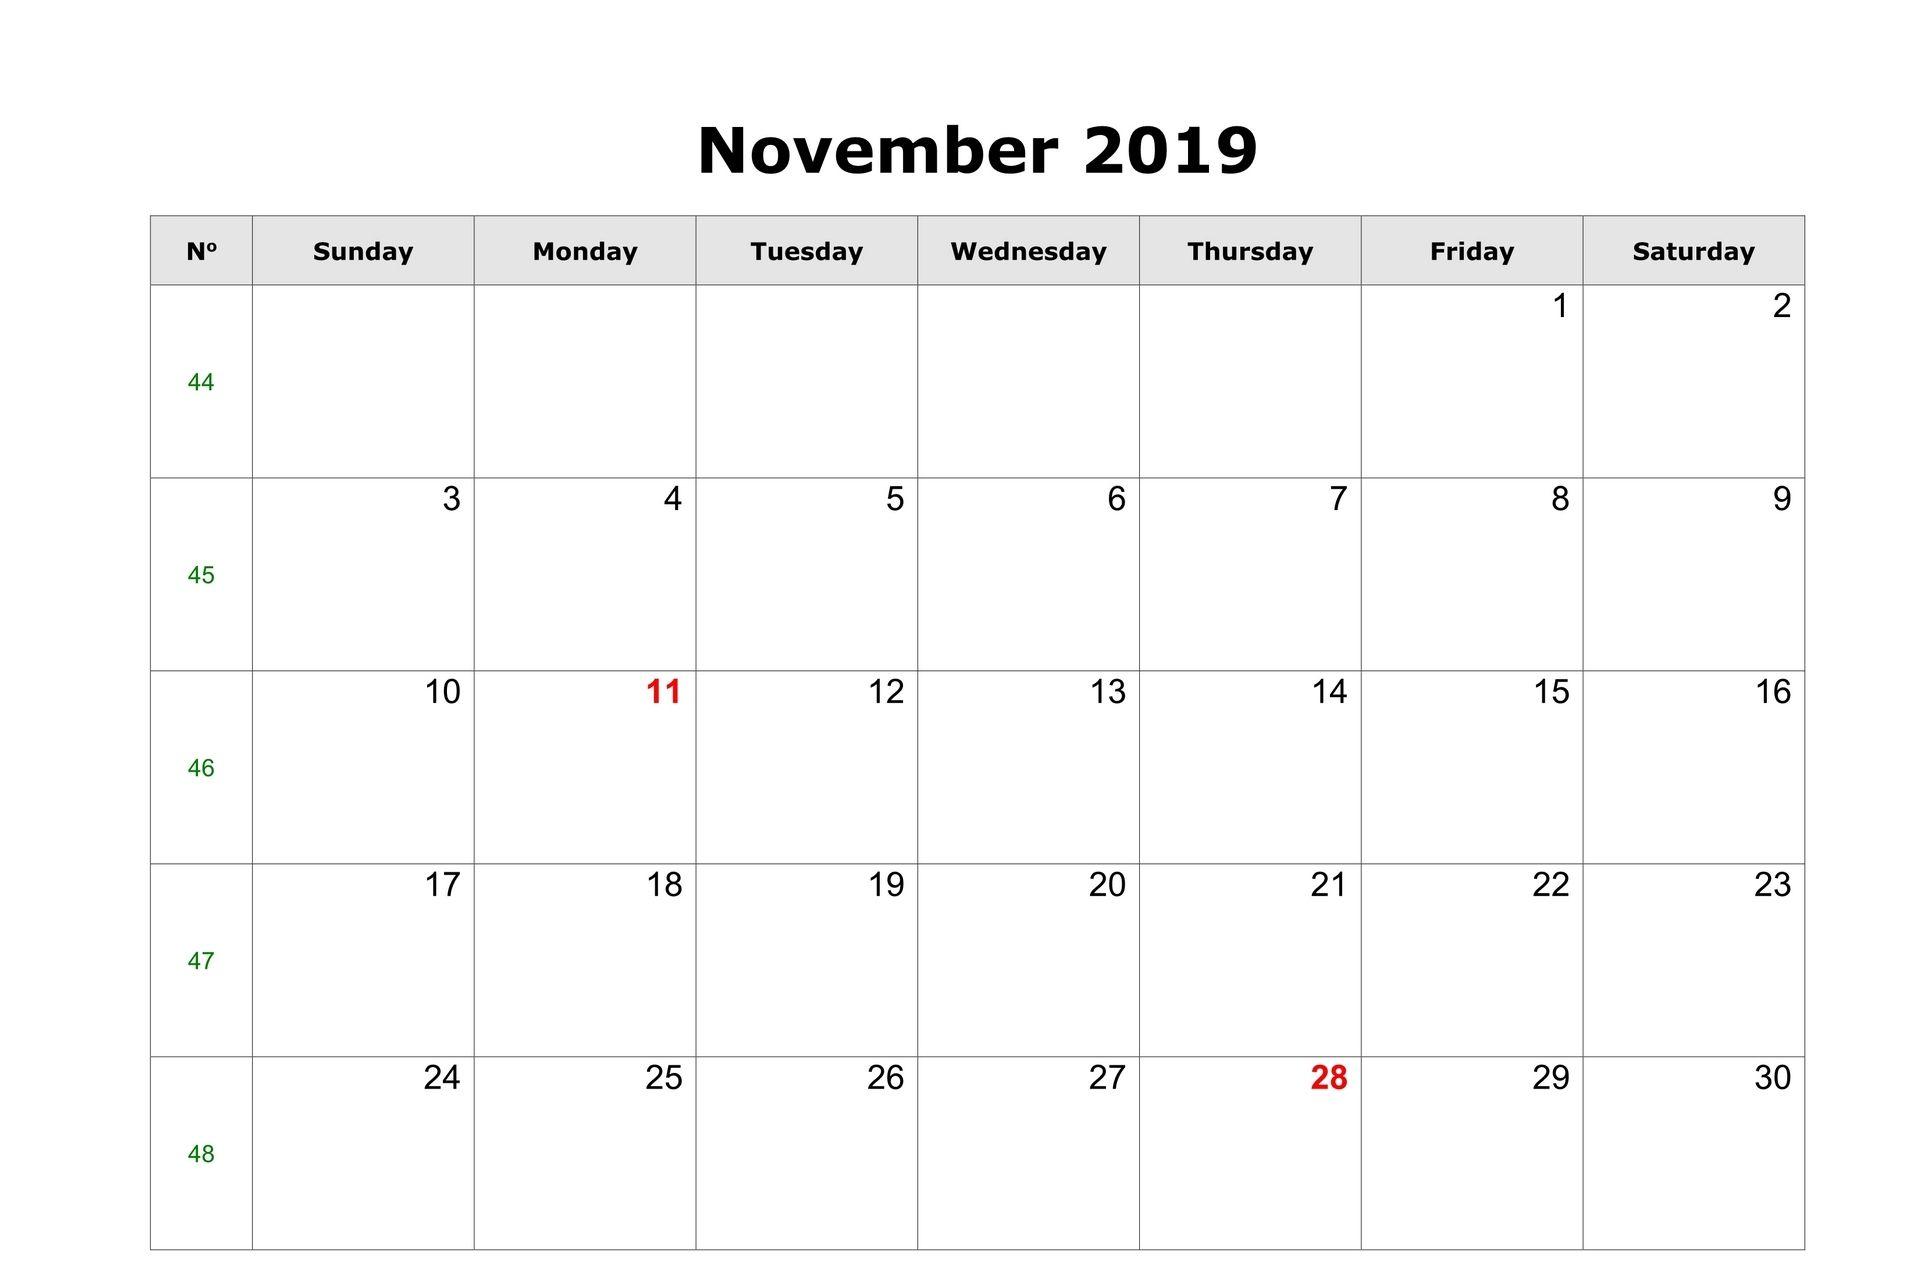 Blank Editable Calendar For November 2019 Calendar Template Free Printable Calendar Templates Editable Calendar